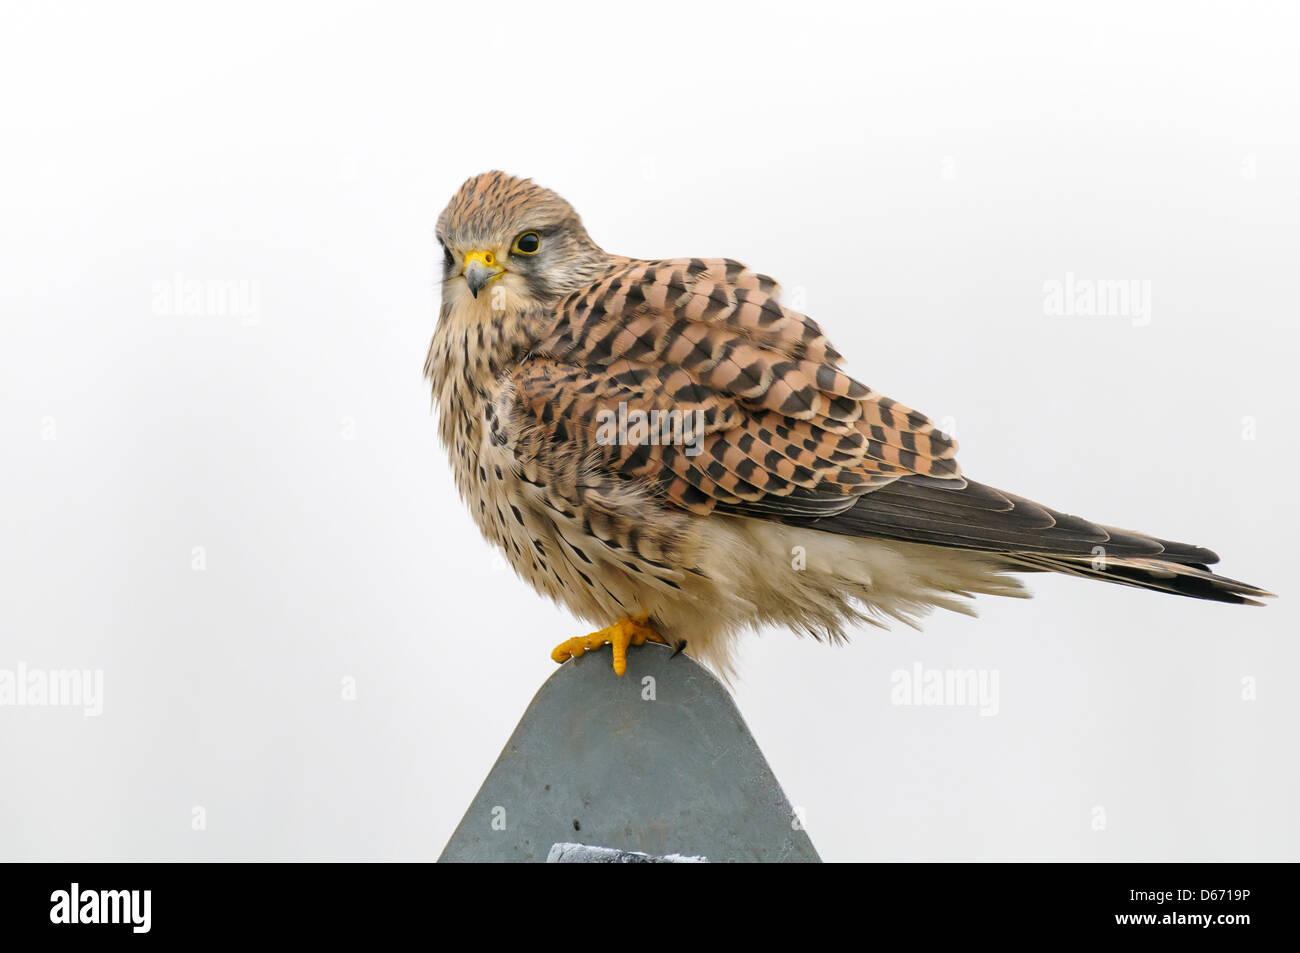 common kestrel, falco tinnunculus - Stock Image